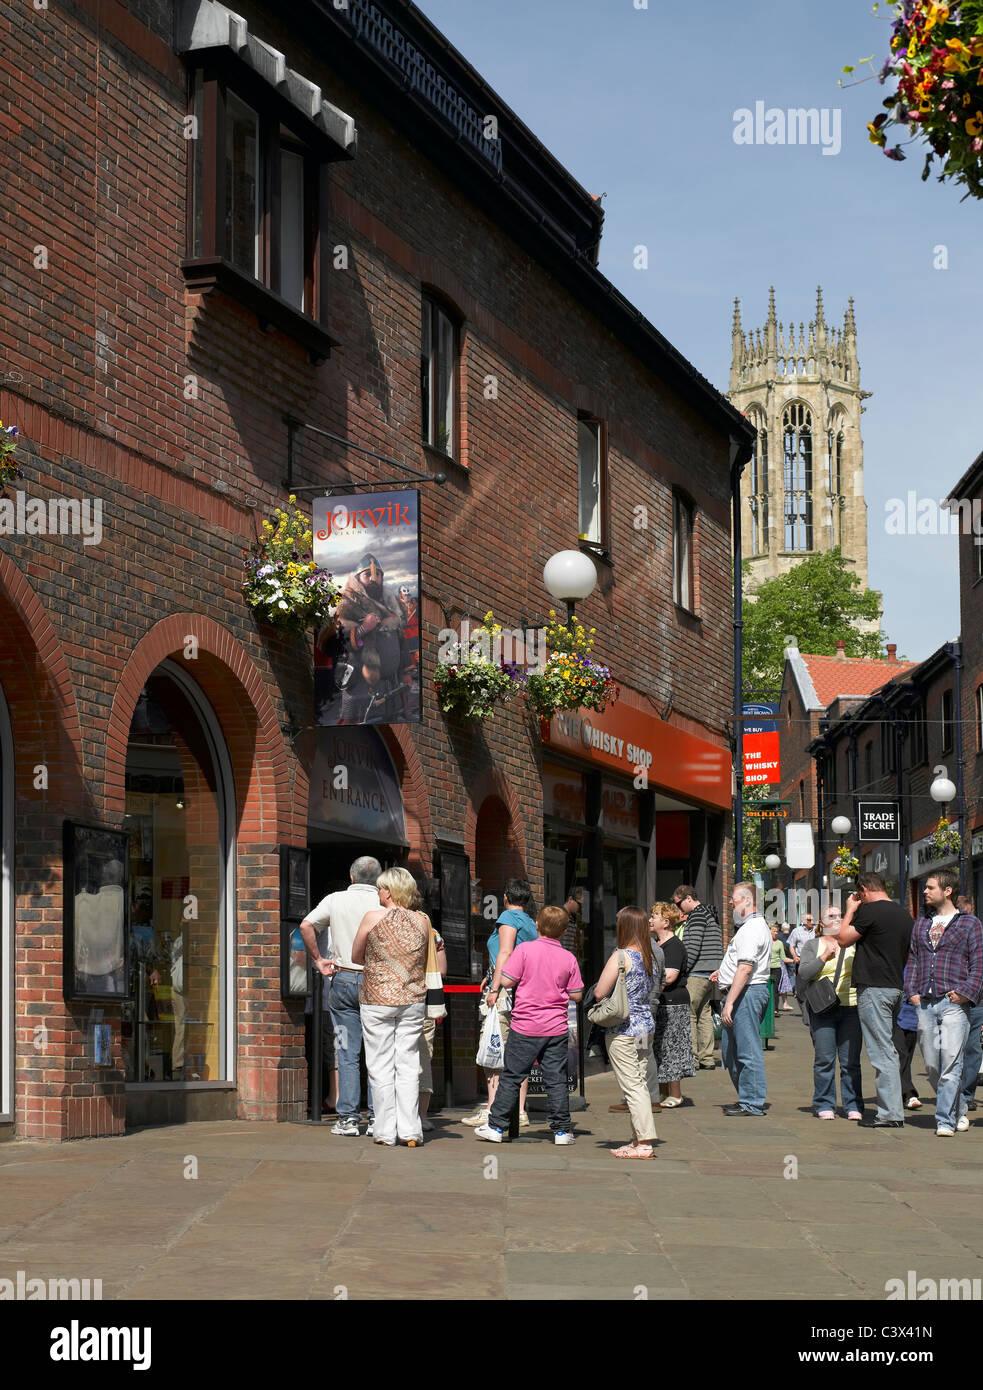 Jorvik Viking Centre Coppergate and All Saints Church in background York North Yorkshire England UK United Kingdom - Stock Image